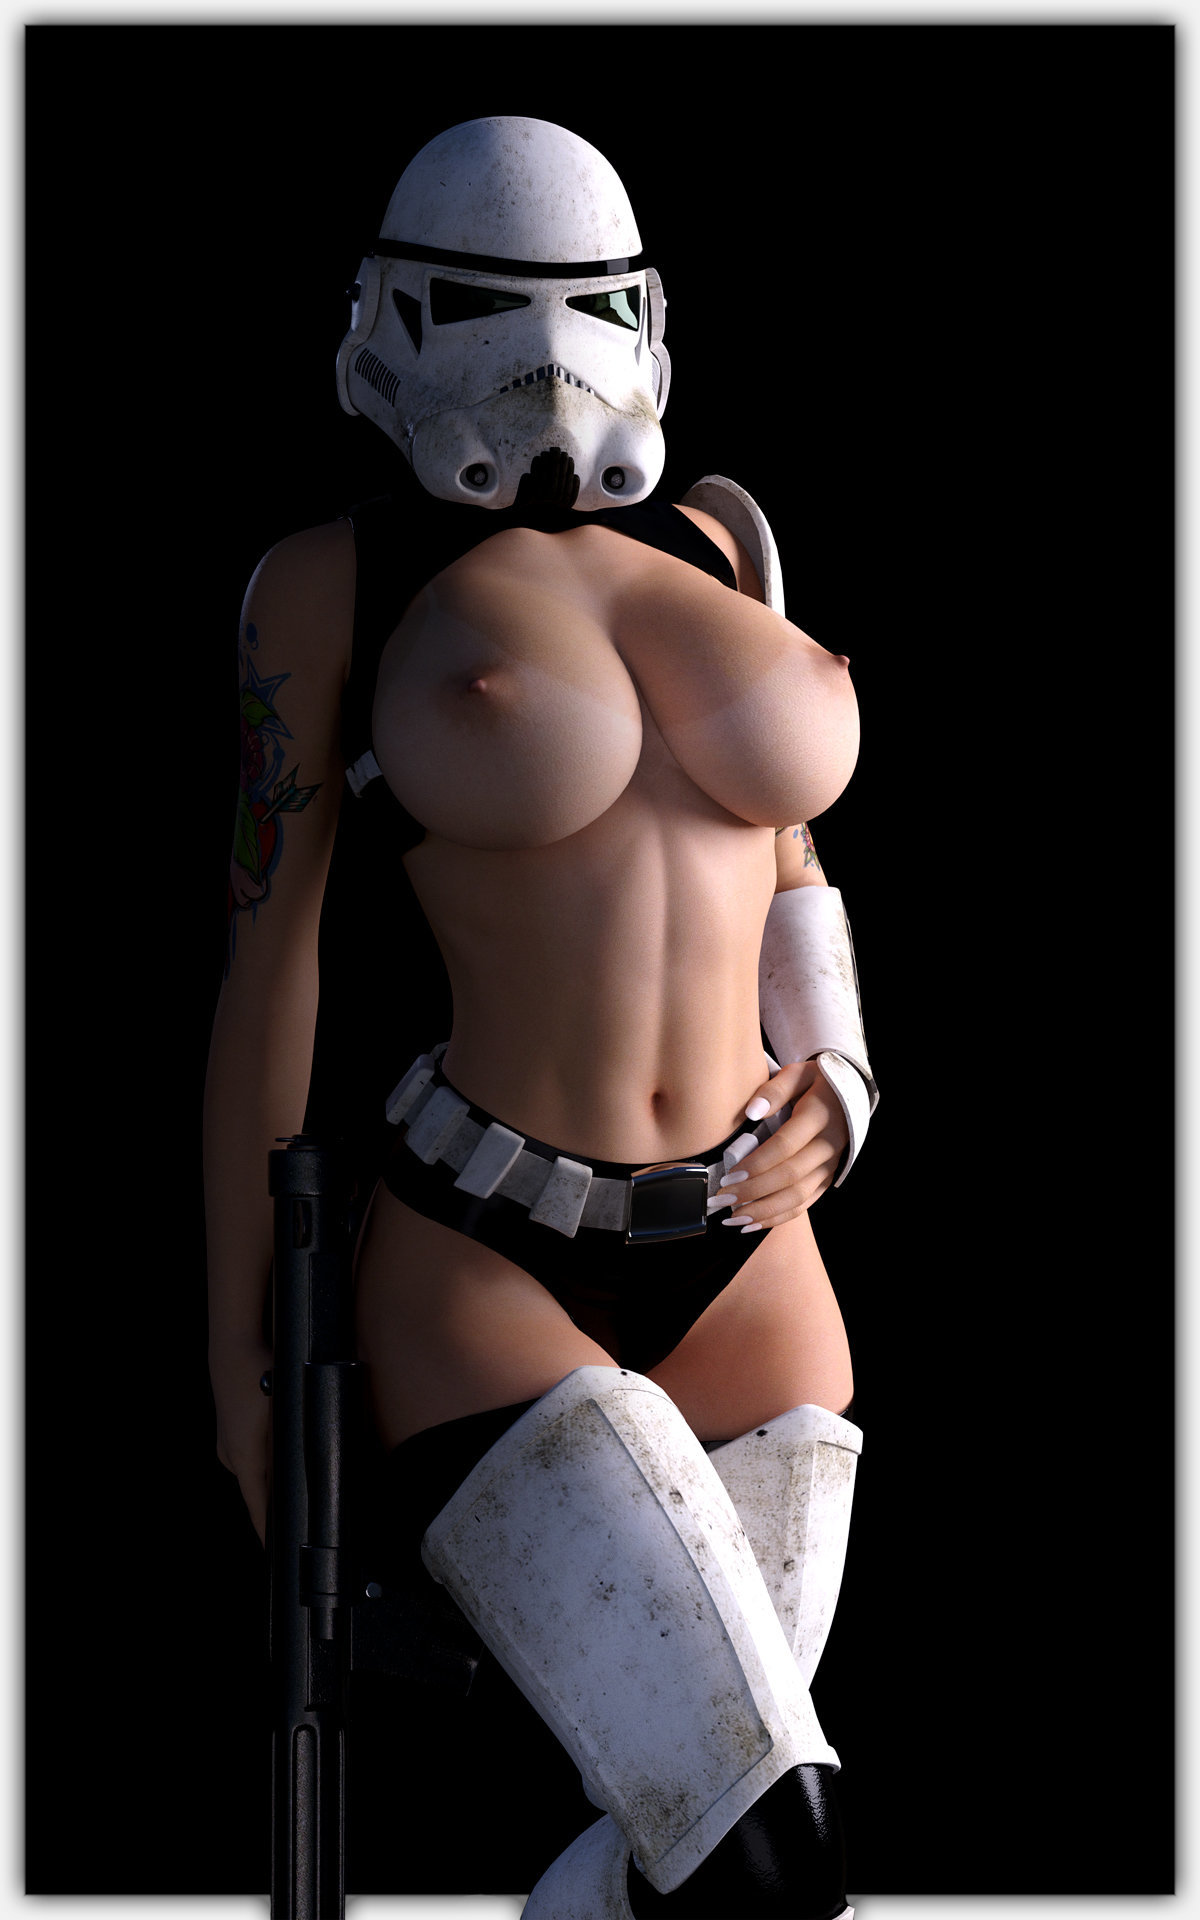 Star wars cosplay free porn pix nackt videos